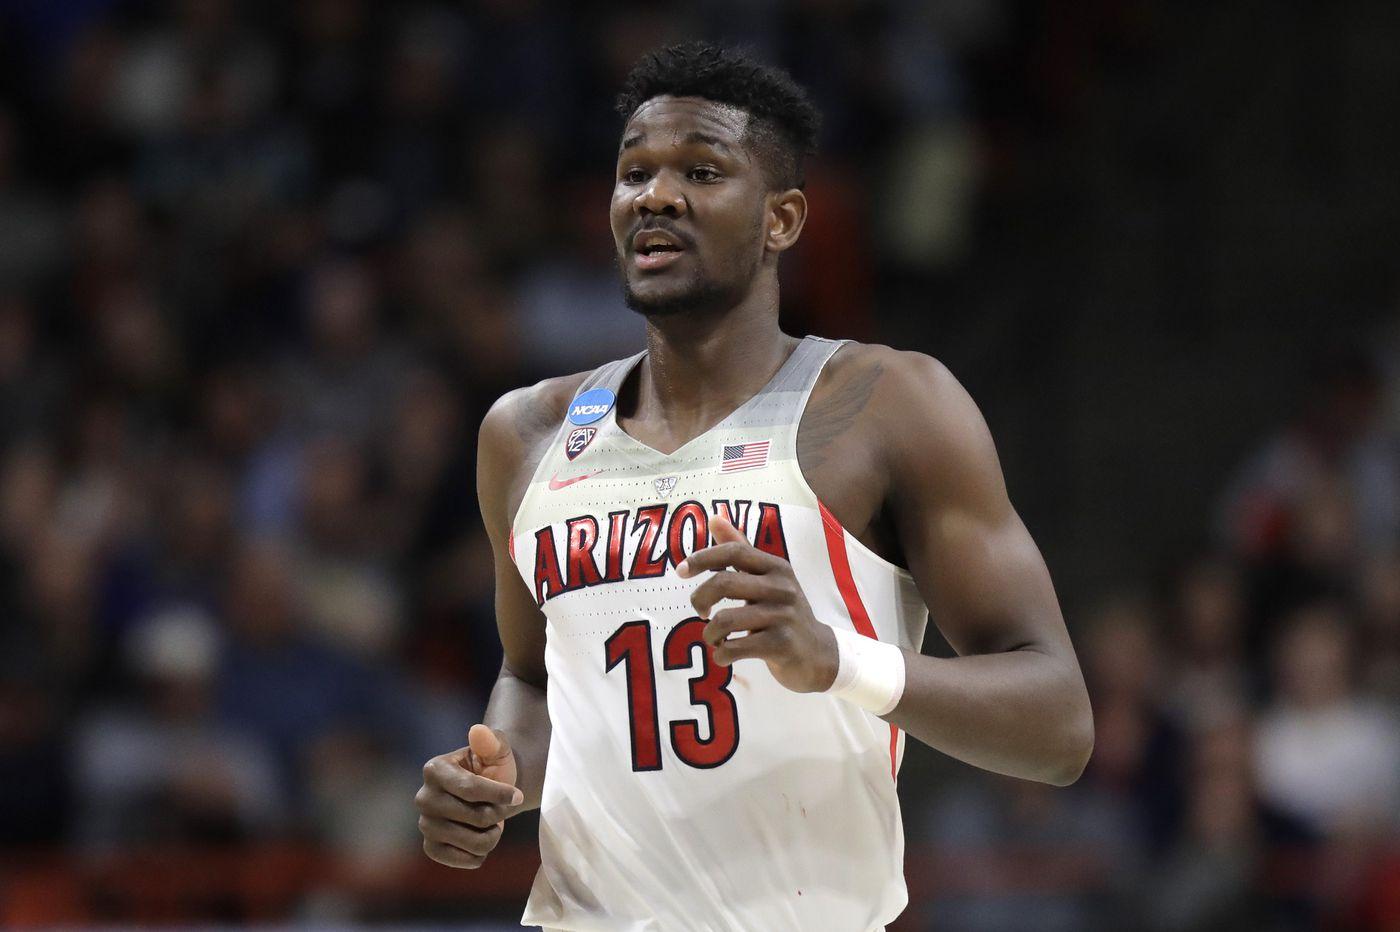 NBA draft: Sixers' picks, TV and streaming info, mock draft roundup